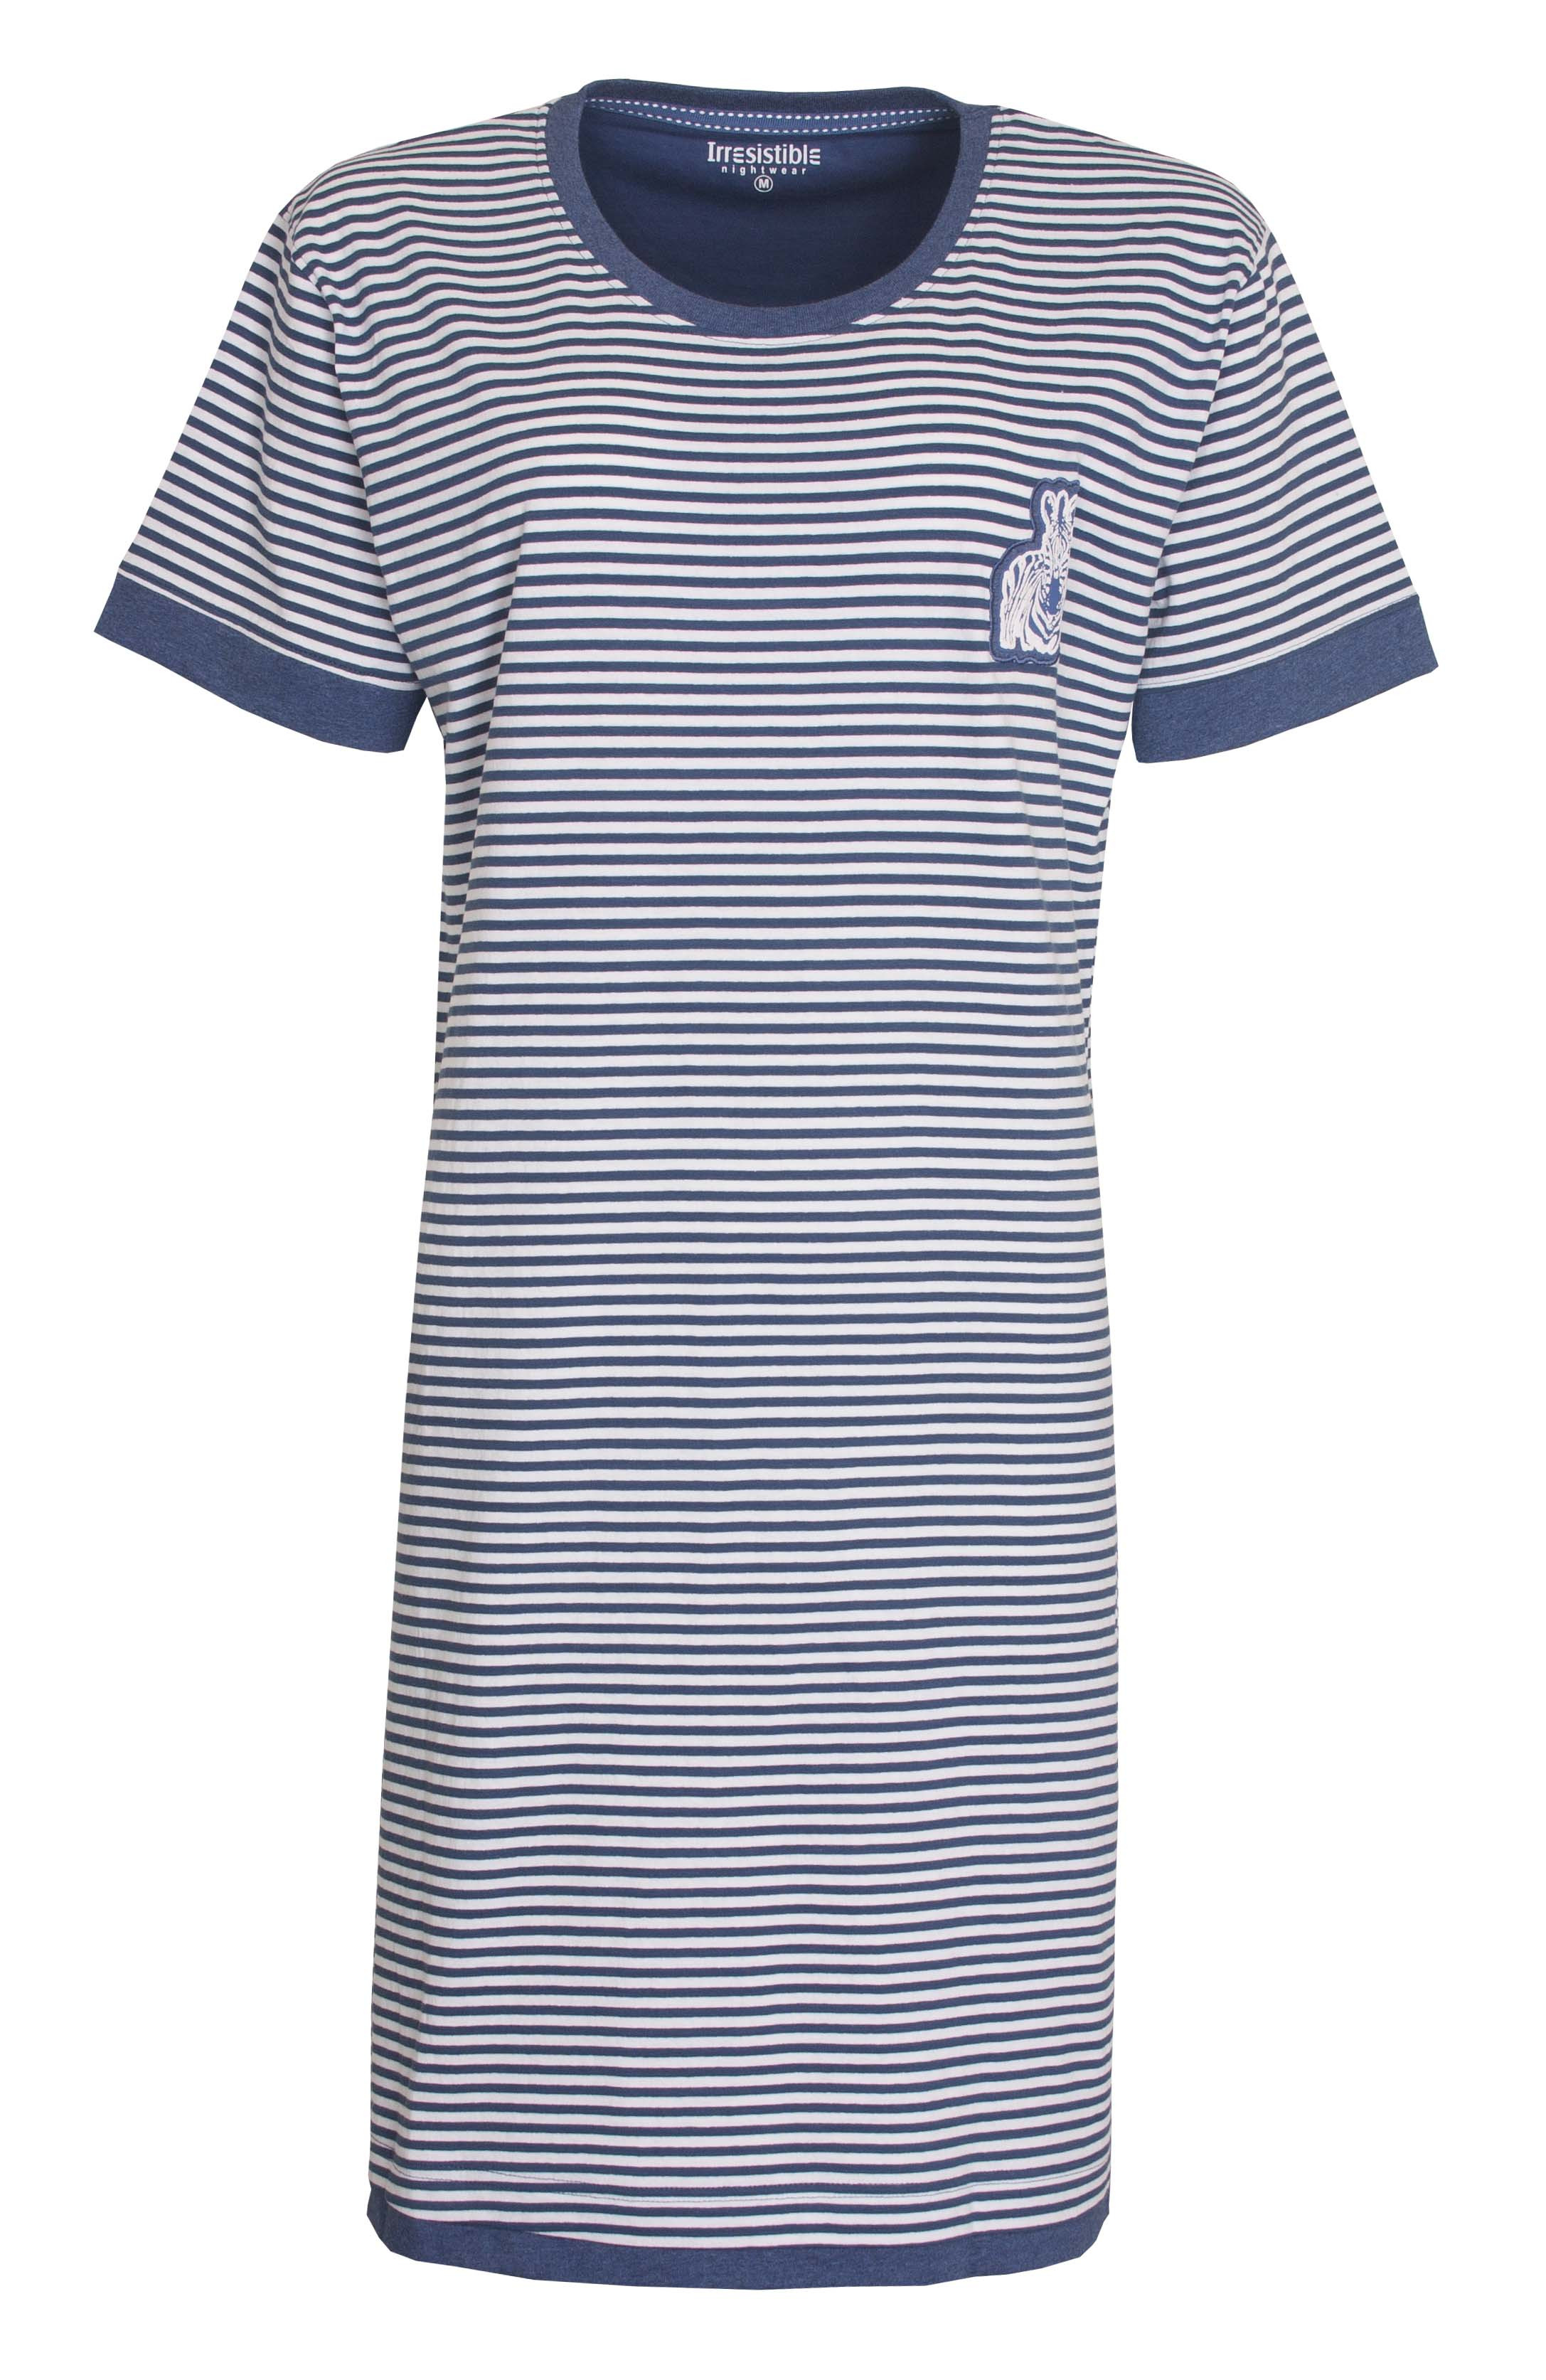 Dames nachthemd IRNGD 1103A-M